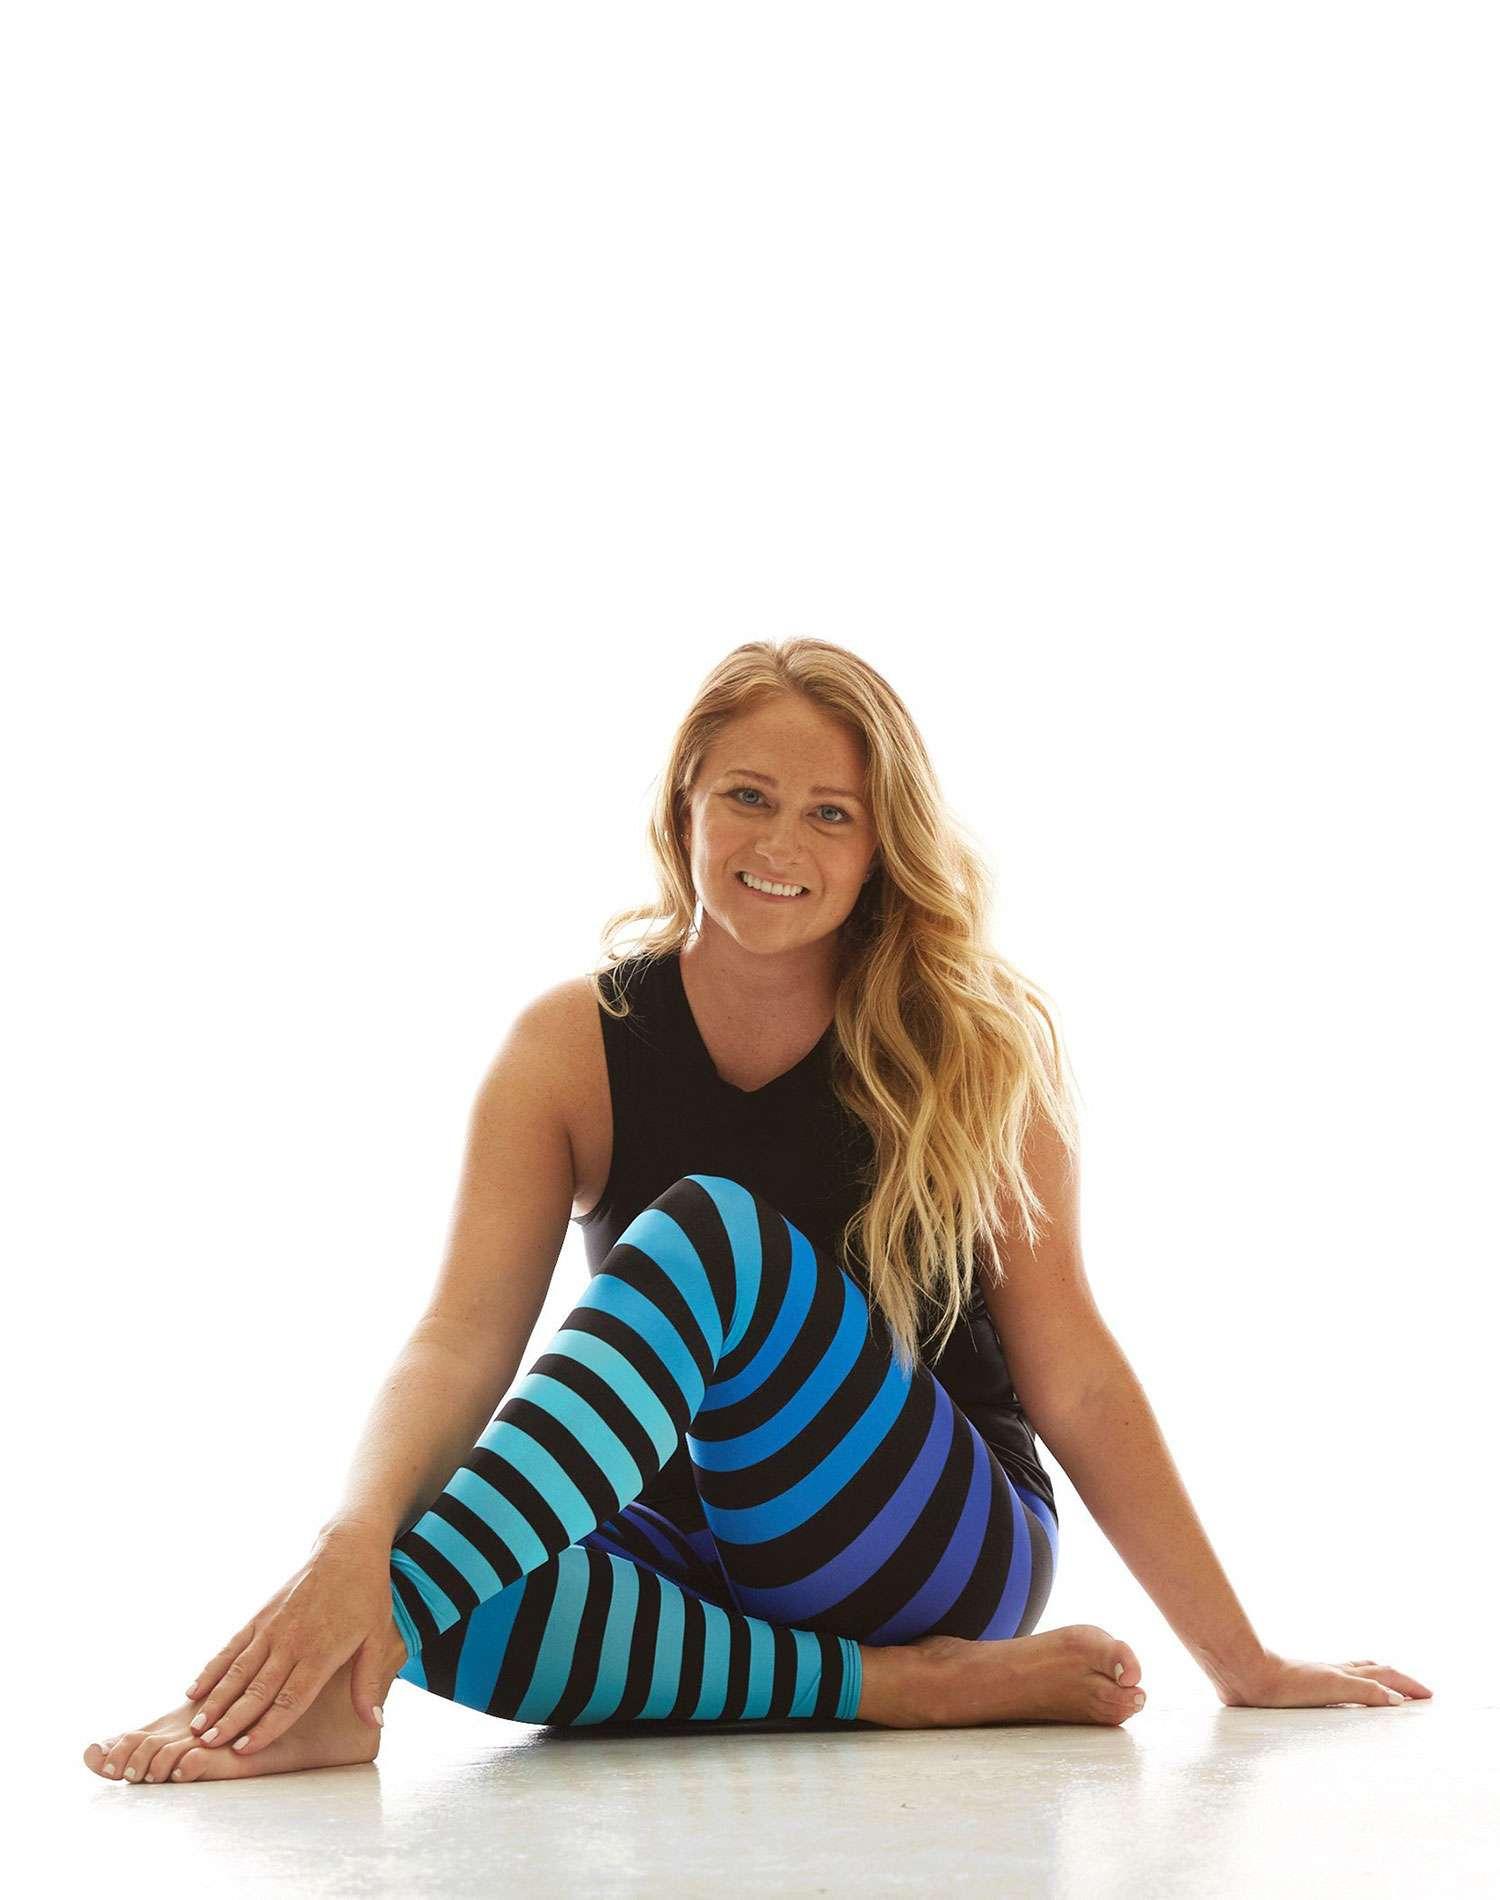 K-Deer yoga leggings uk official online retailer